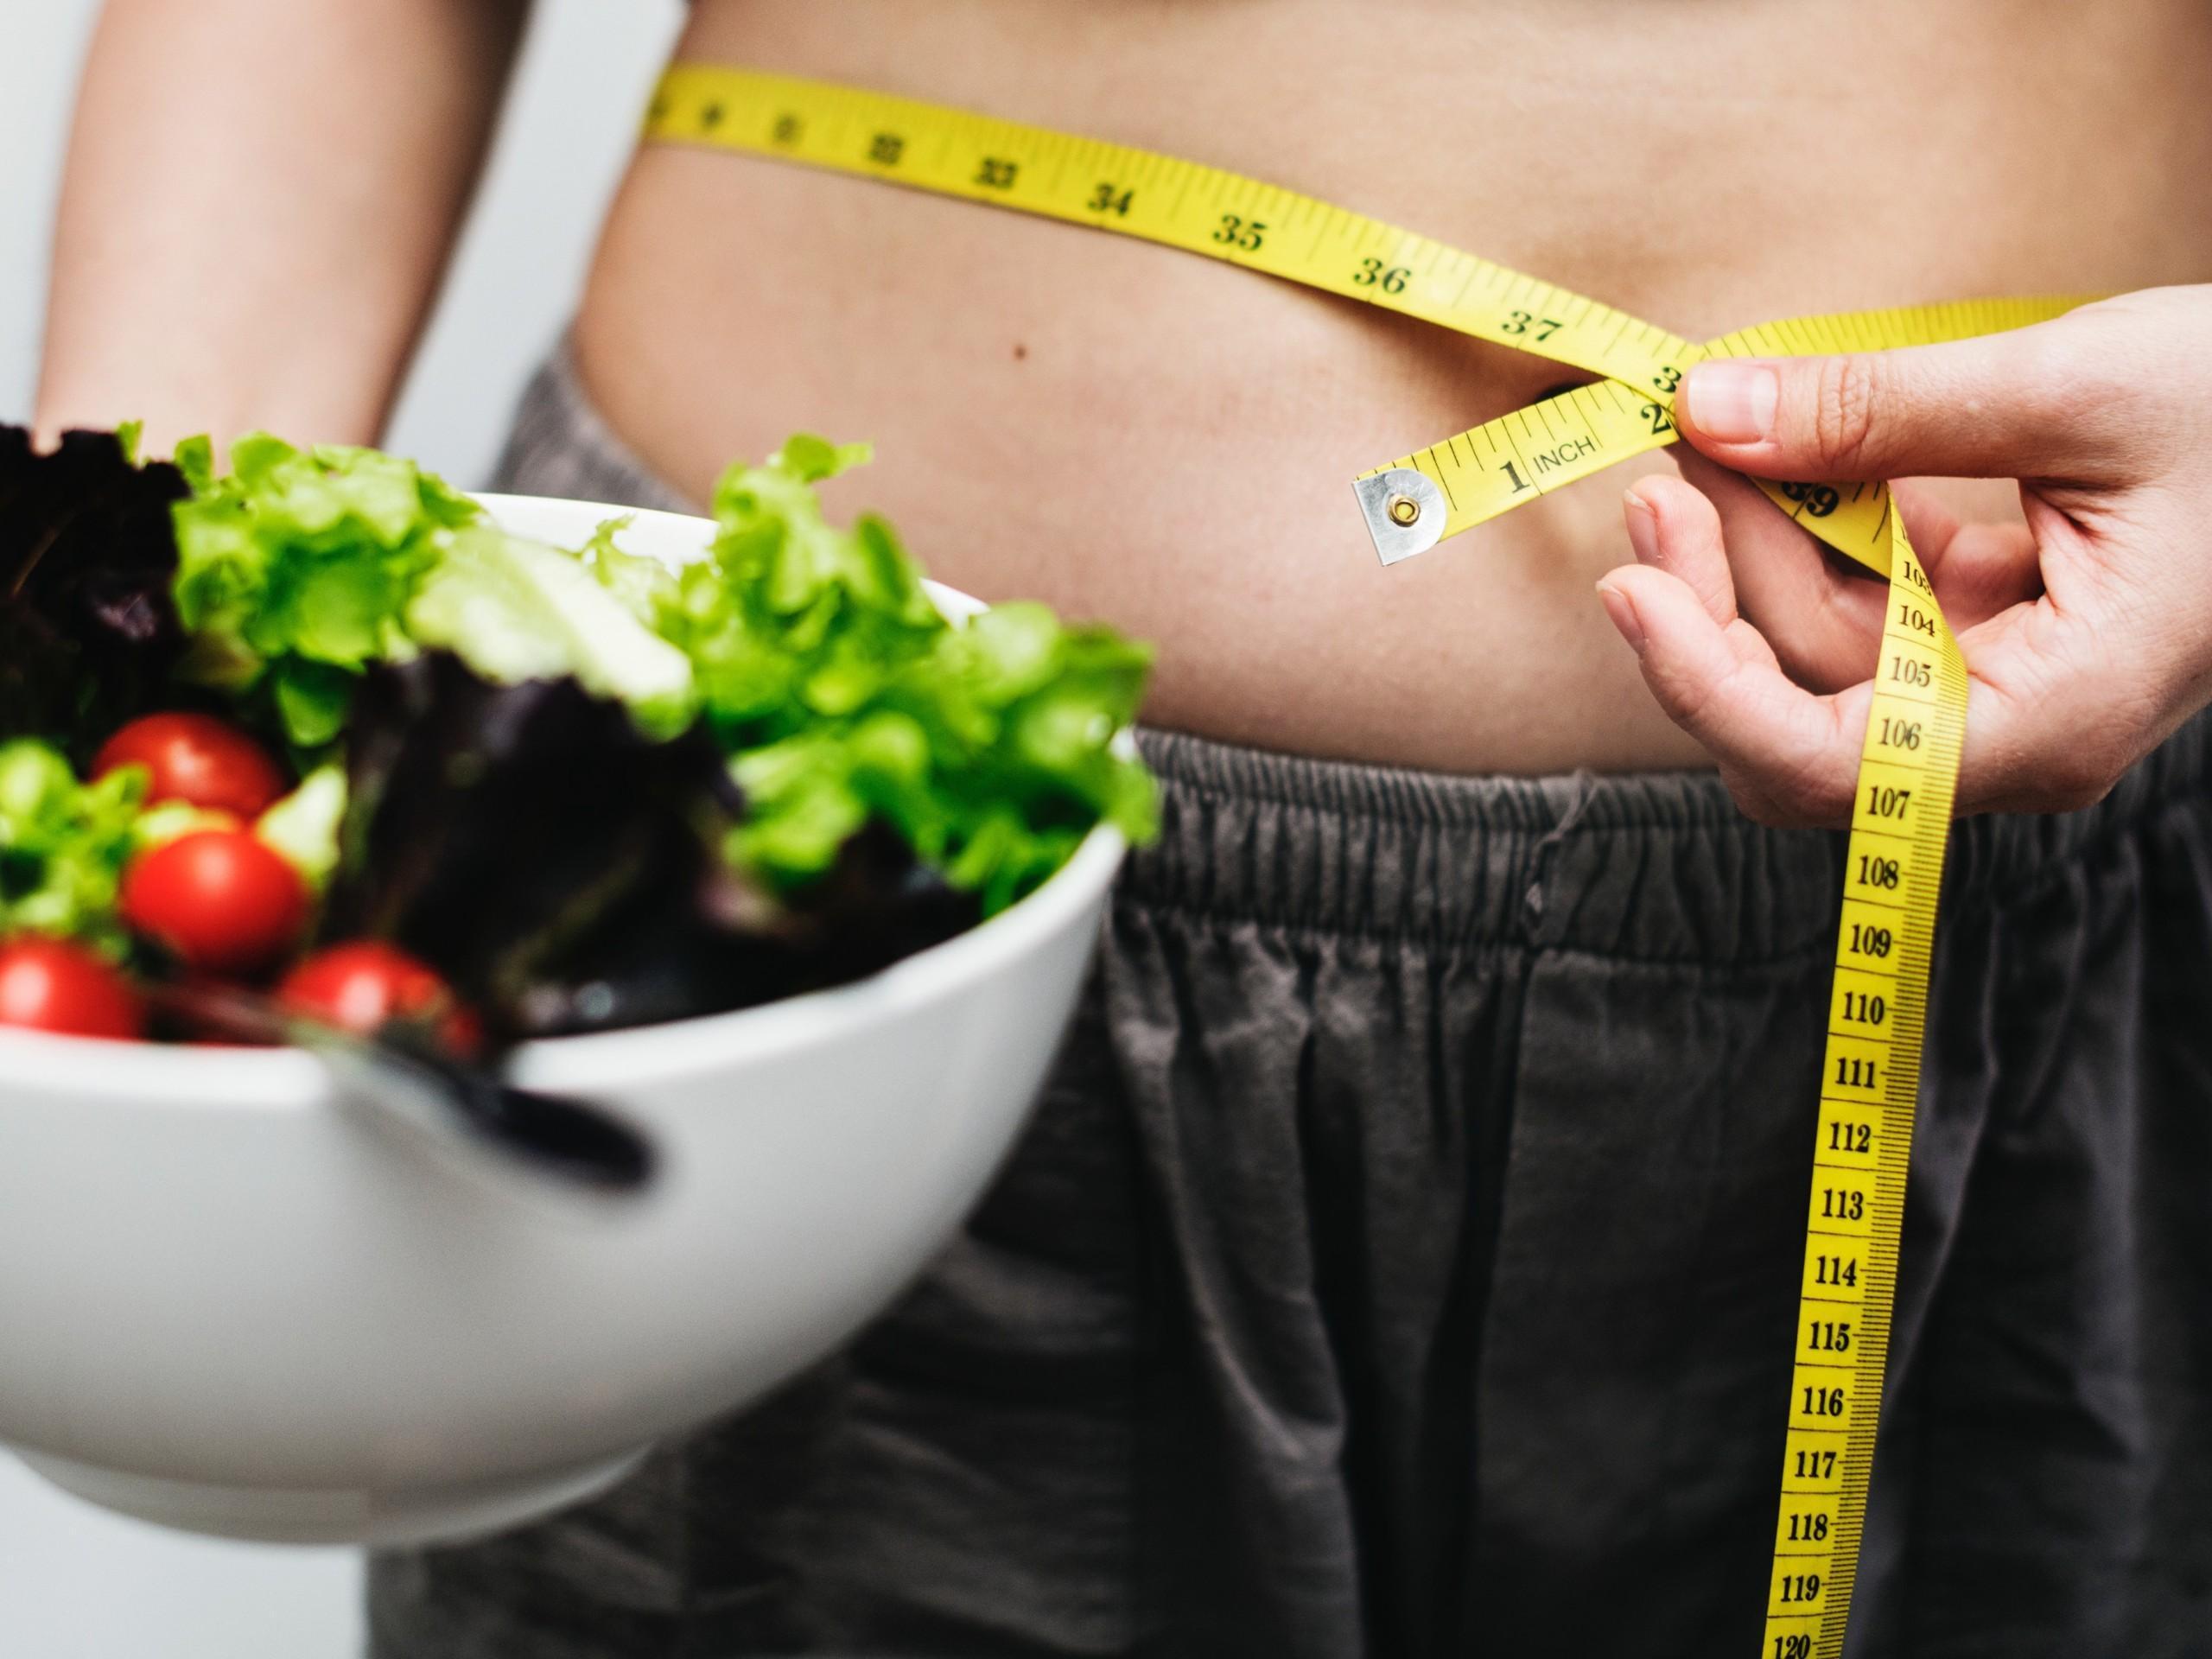 Maksan puhdistus hoituu tehokkaasti terveellä ruokavaliolla